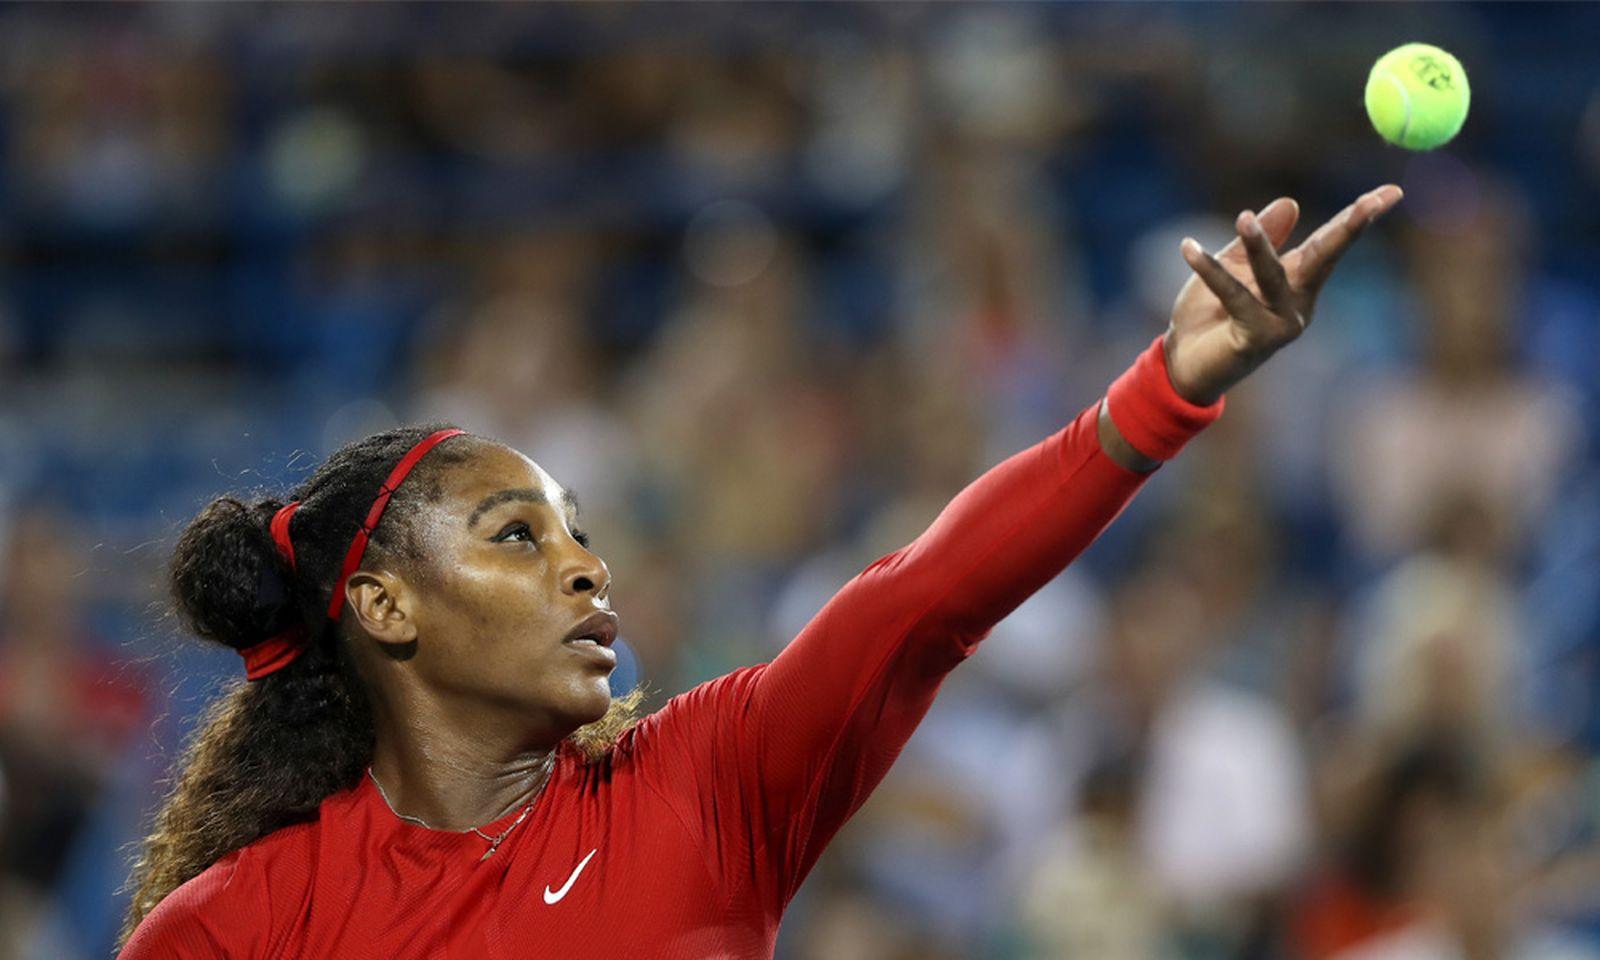 serena williams highest paid female athlete 2018 female athletes forbes